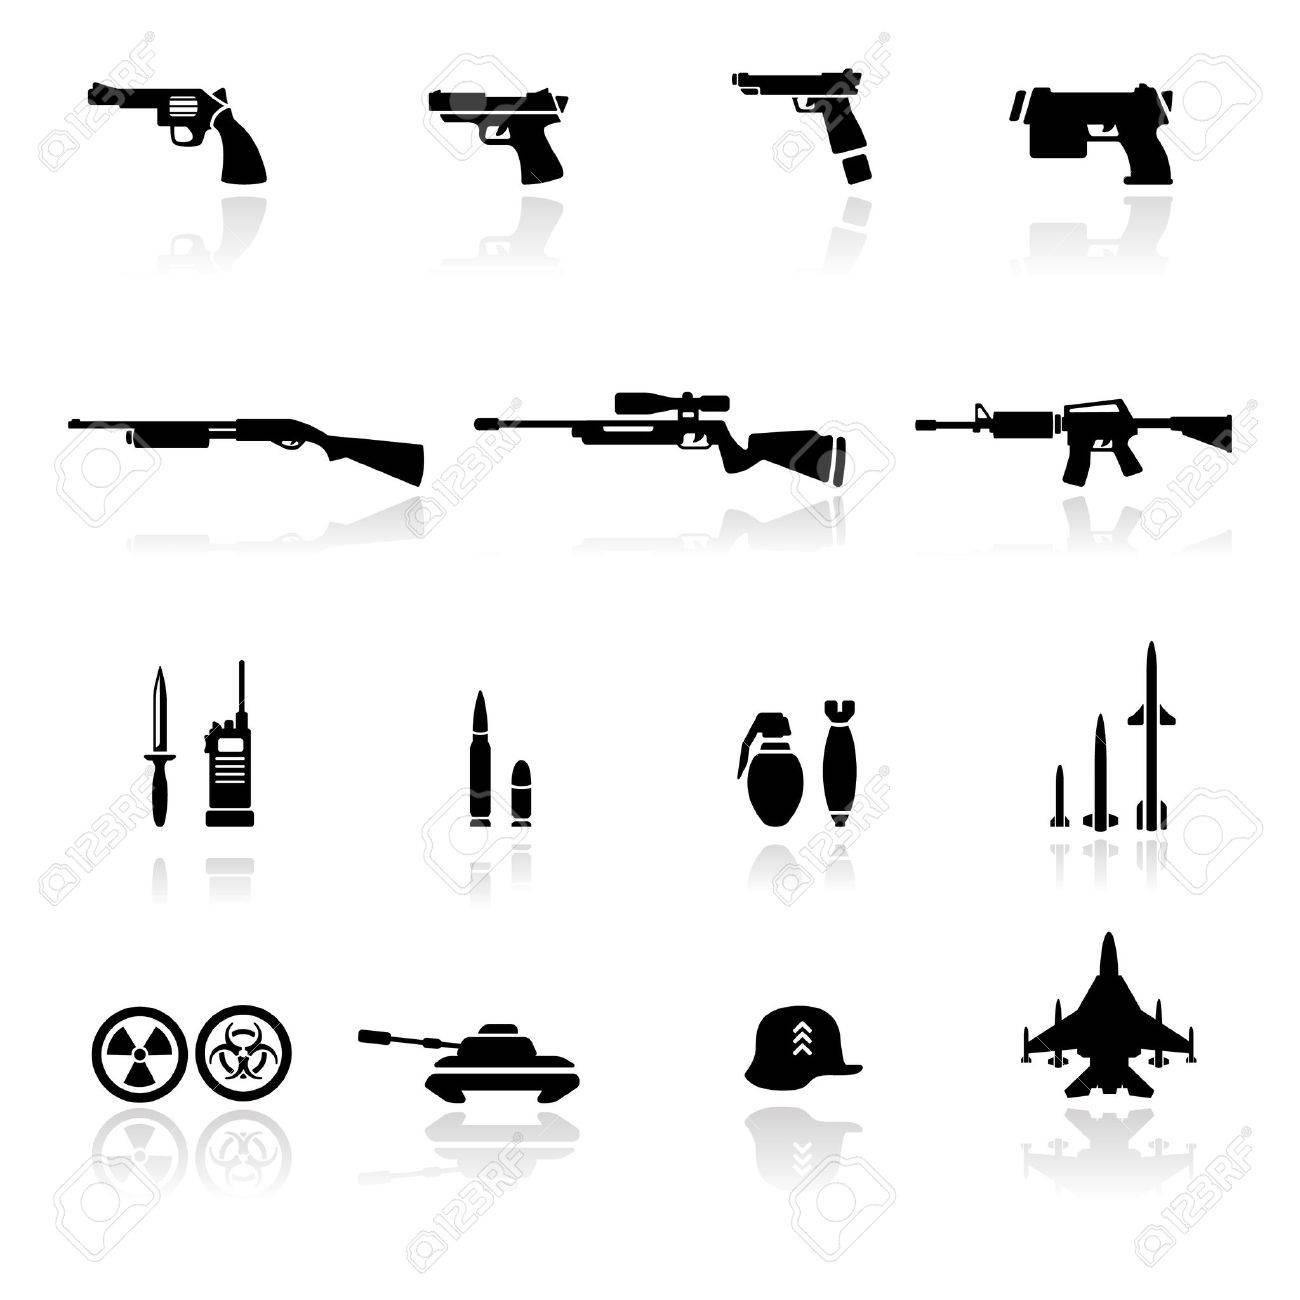 Icon set Weapons - 9811376